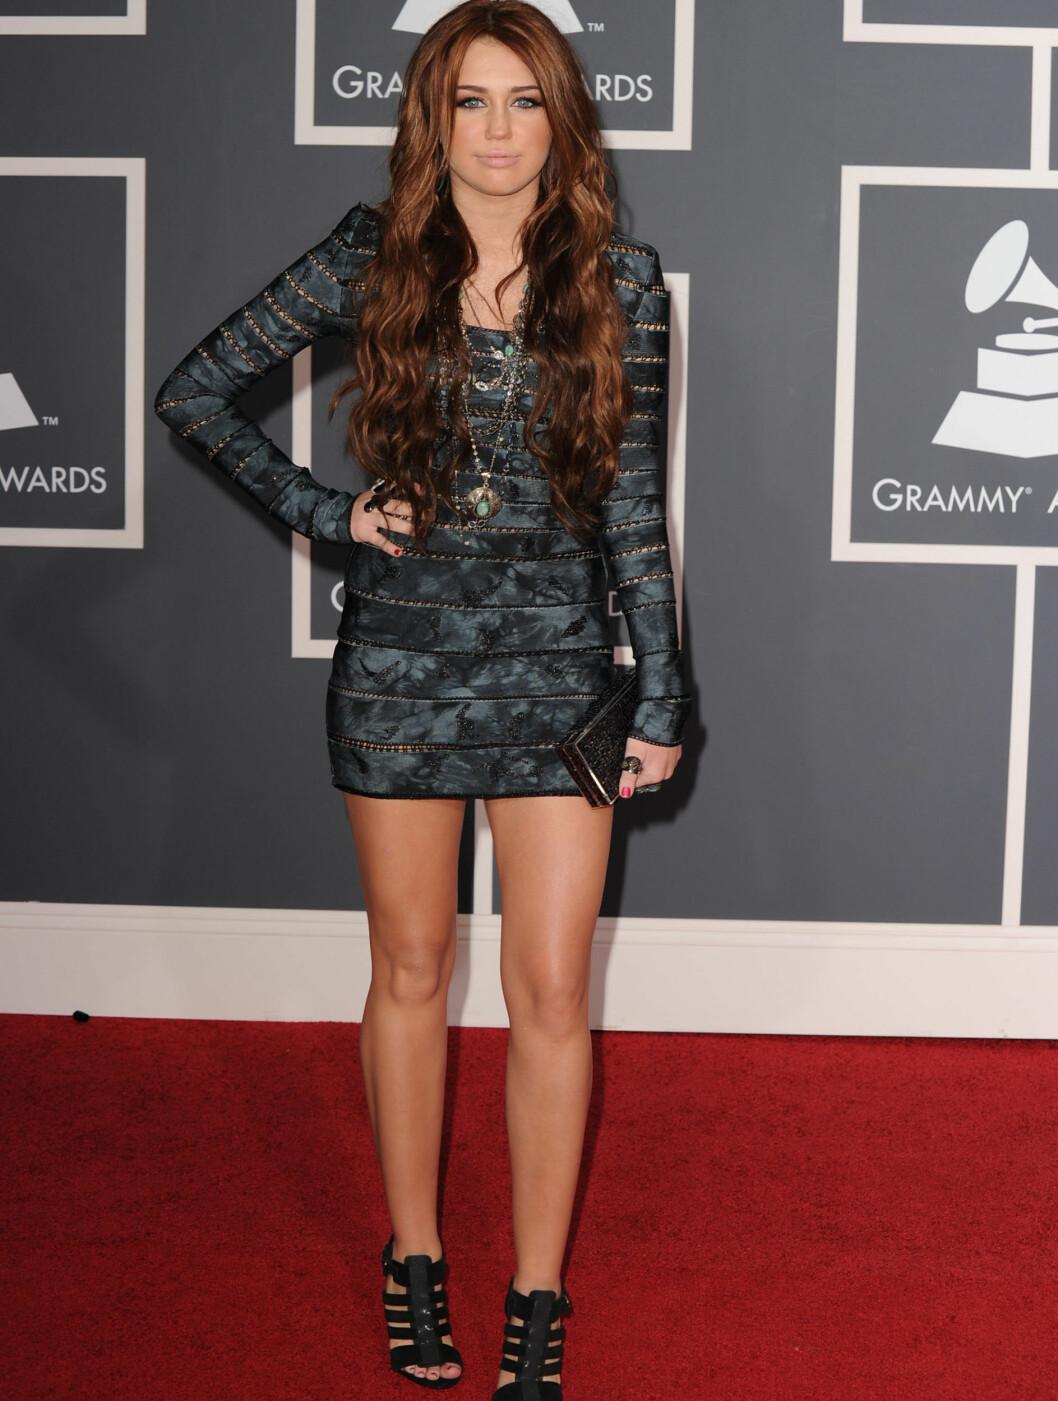 GA UT PRIS: 17 år gamle Miley Cyrus kom i denne drakten fra Max Azria. Foto: All Over Press